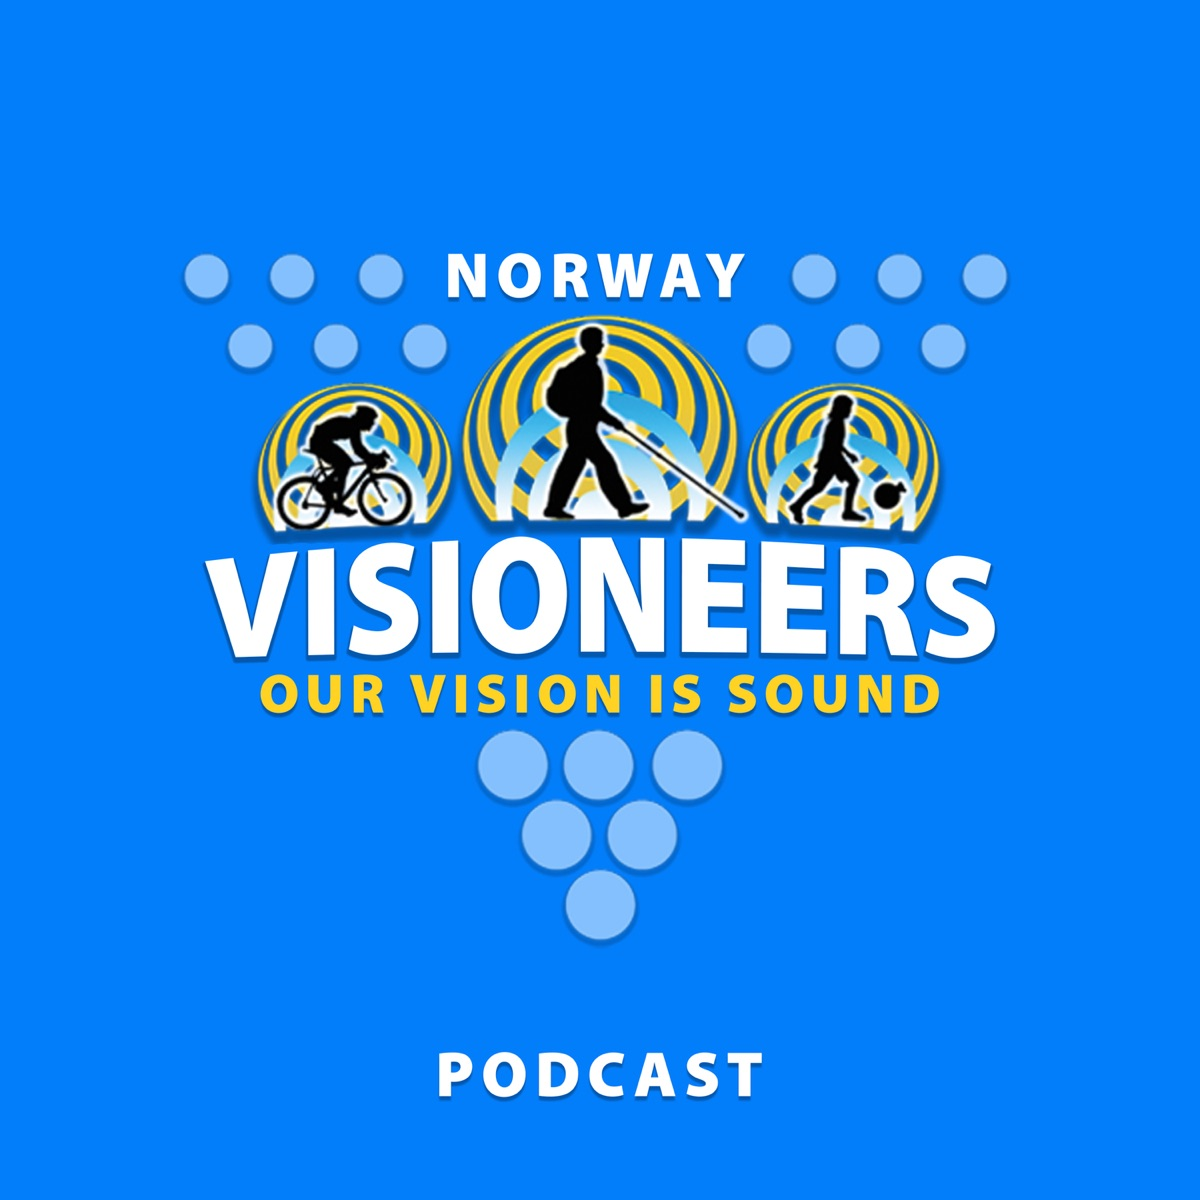 Visioneers Norways podcast